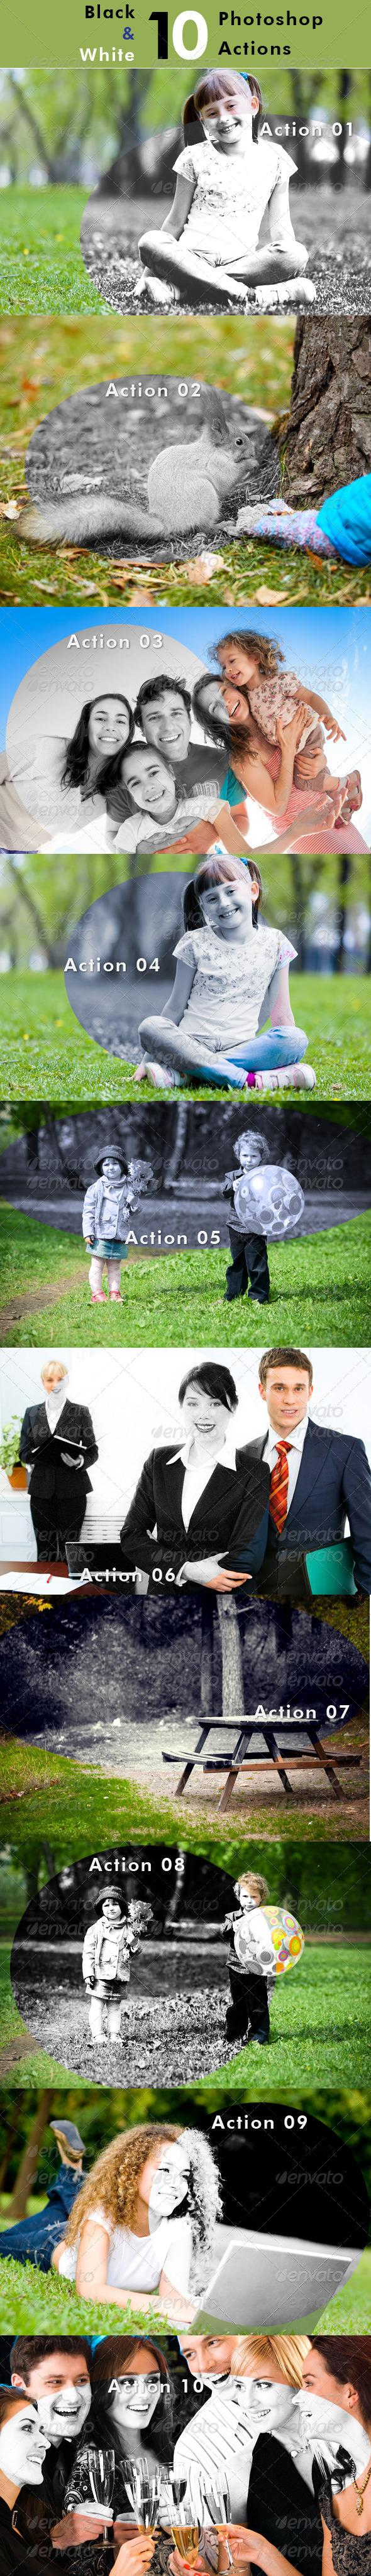 GraphicRiver 10 Black & White Photoshop Premium Actions 7111248